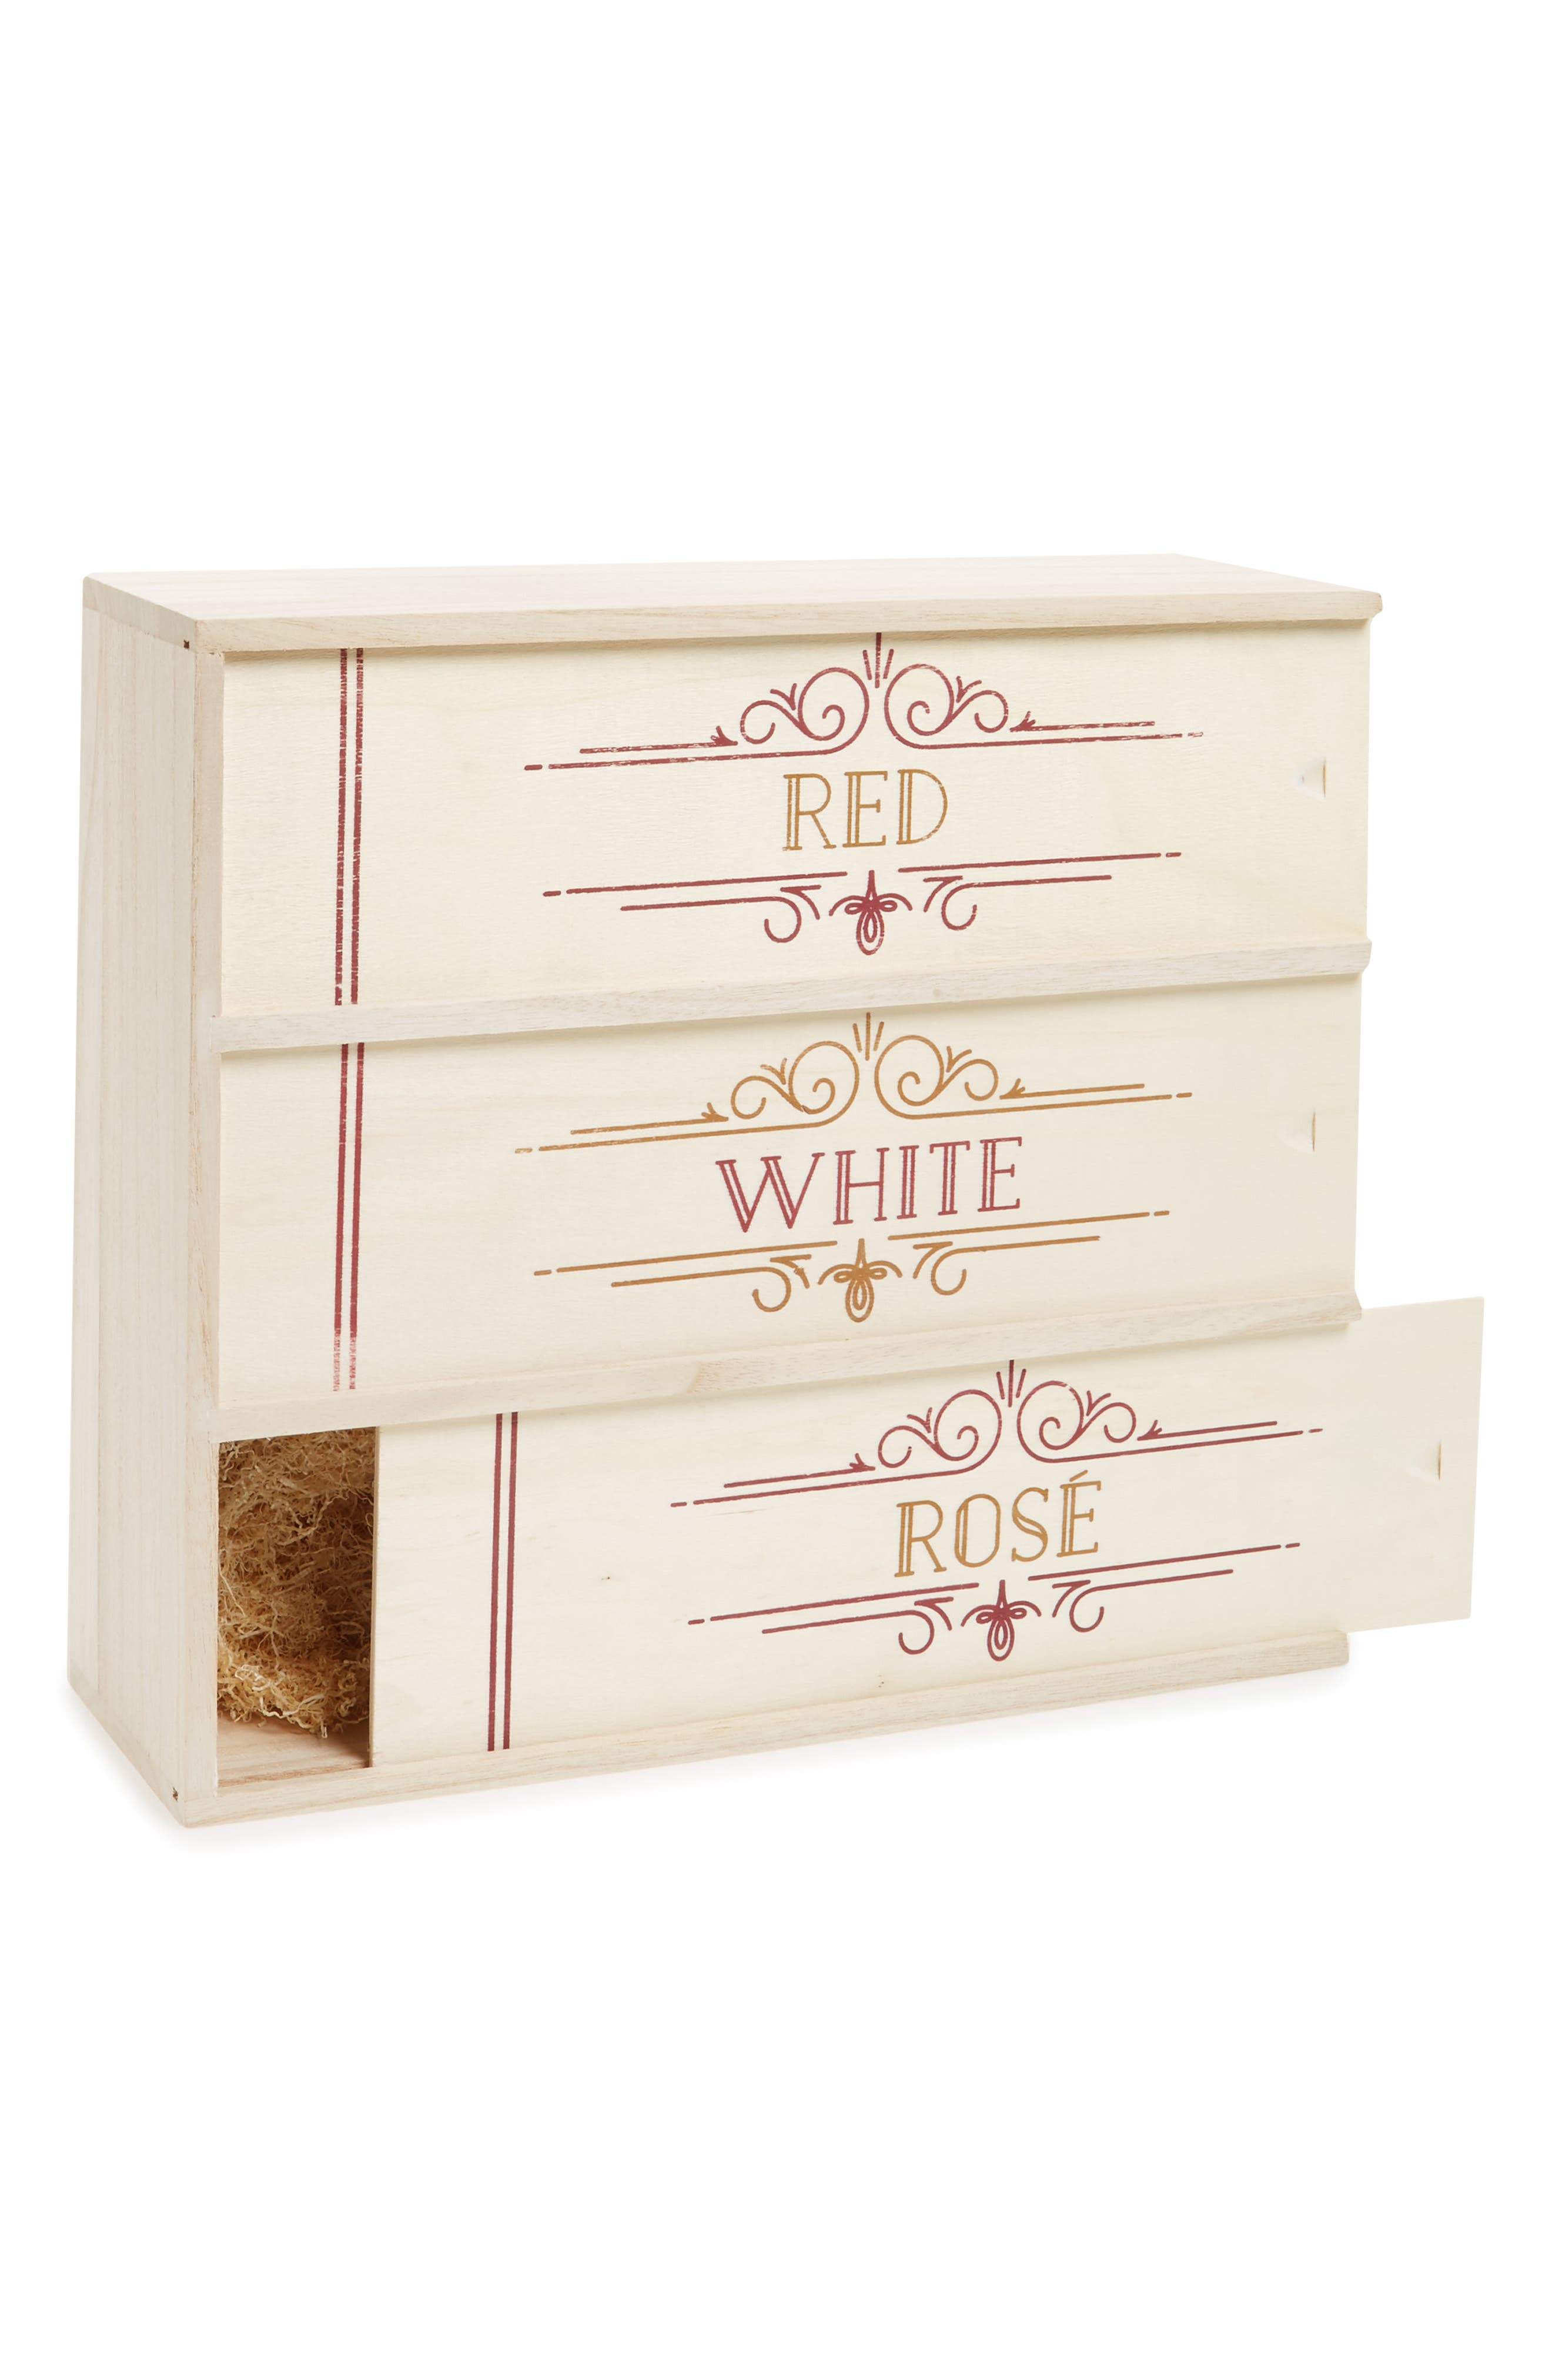 Red, White & Rosé Wine Box,                         Main,                         color, Beige